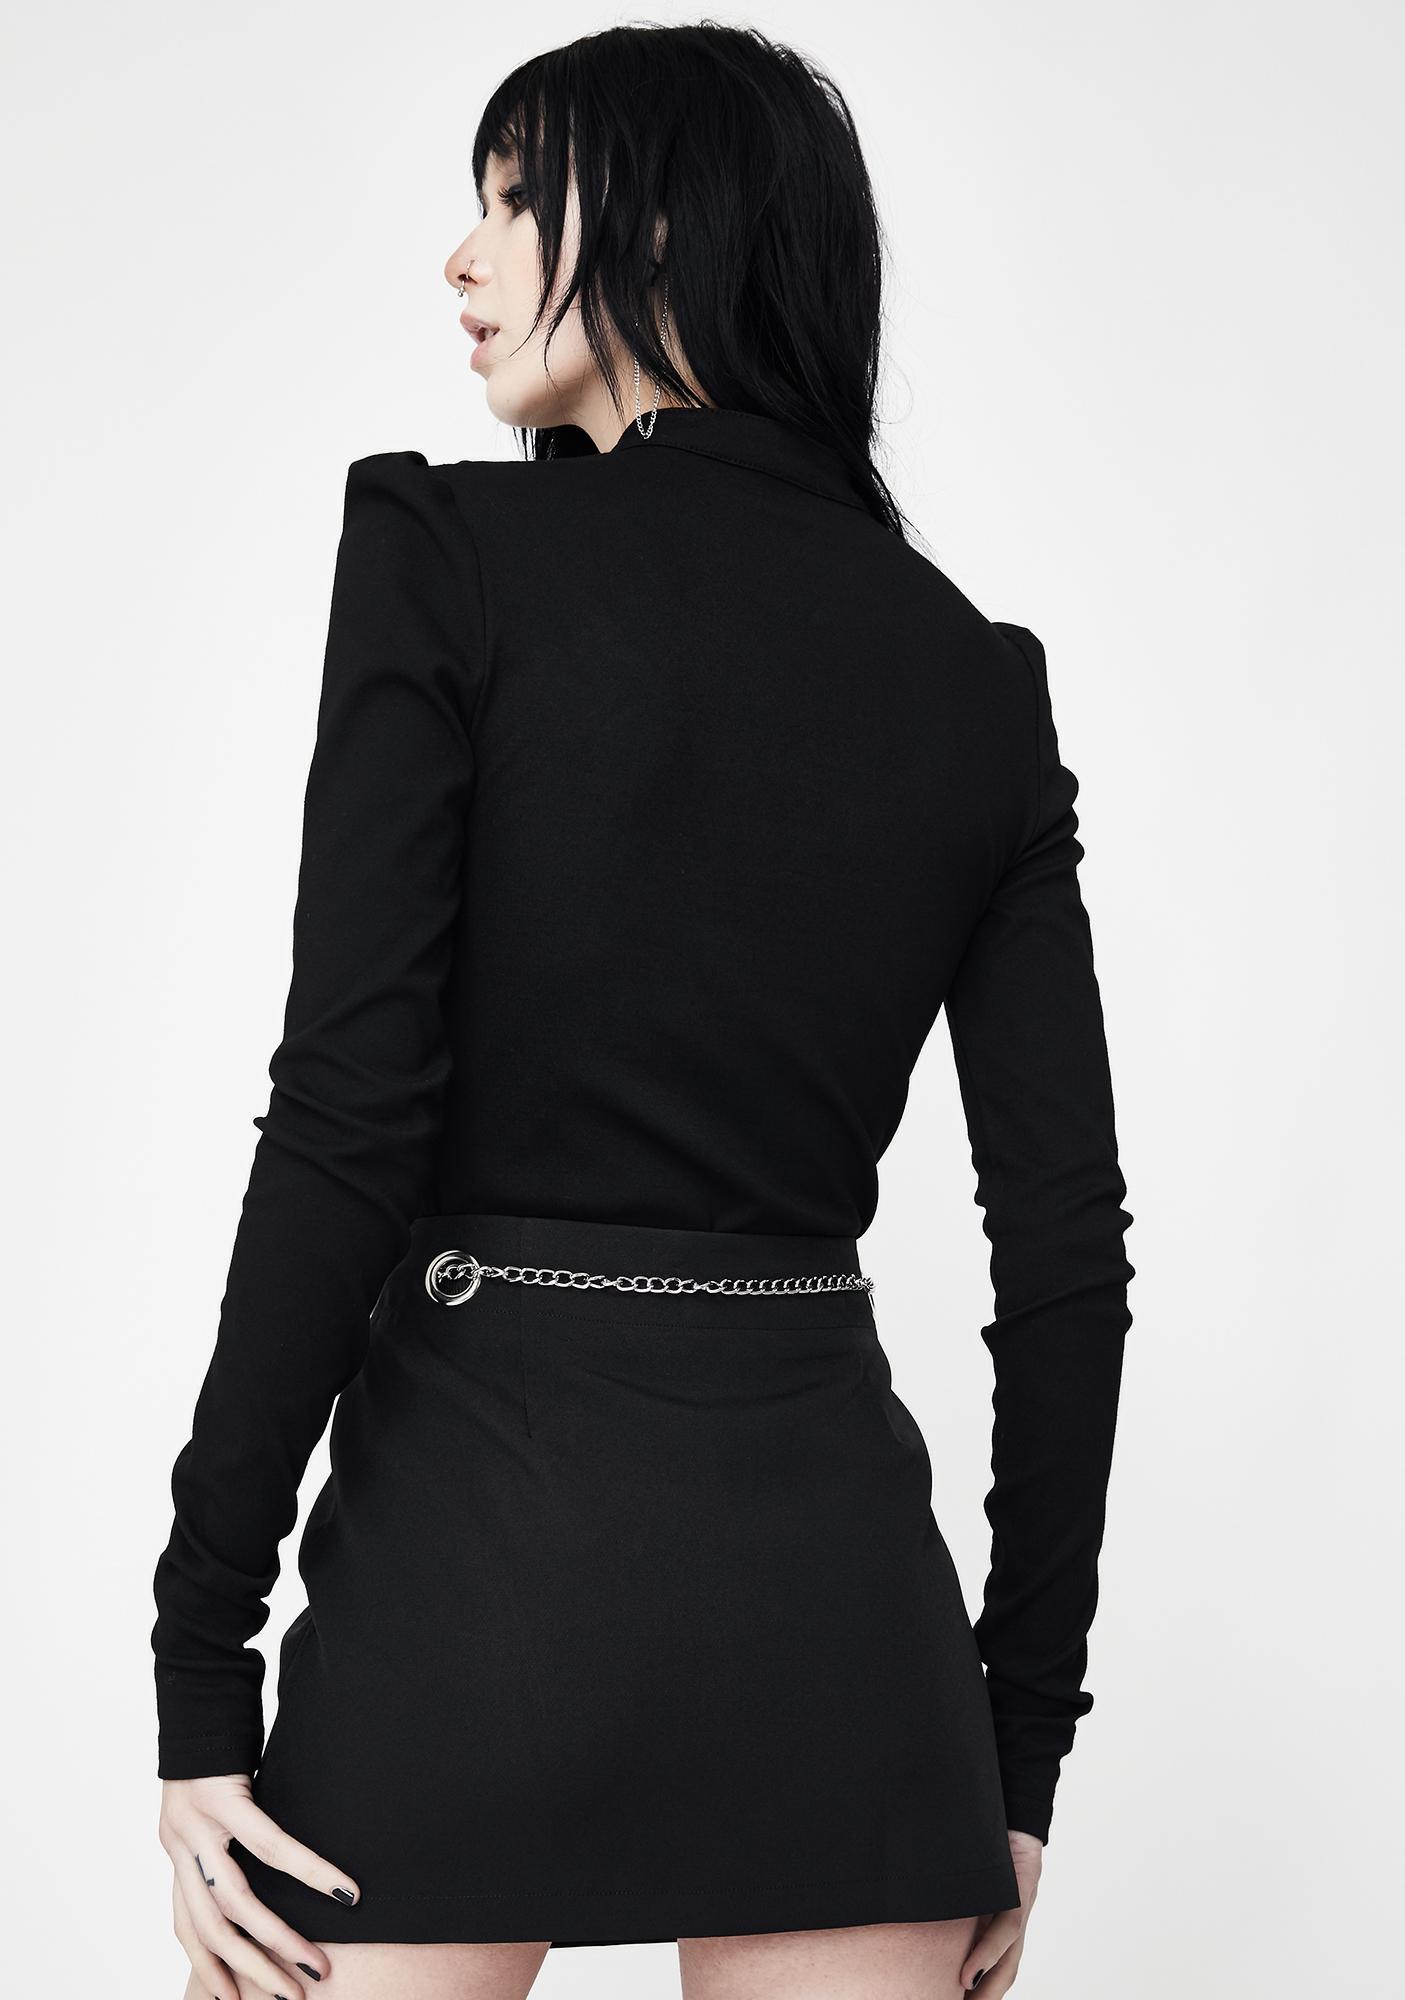 Punk Rave Chain Belt A-Line Skirt